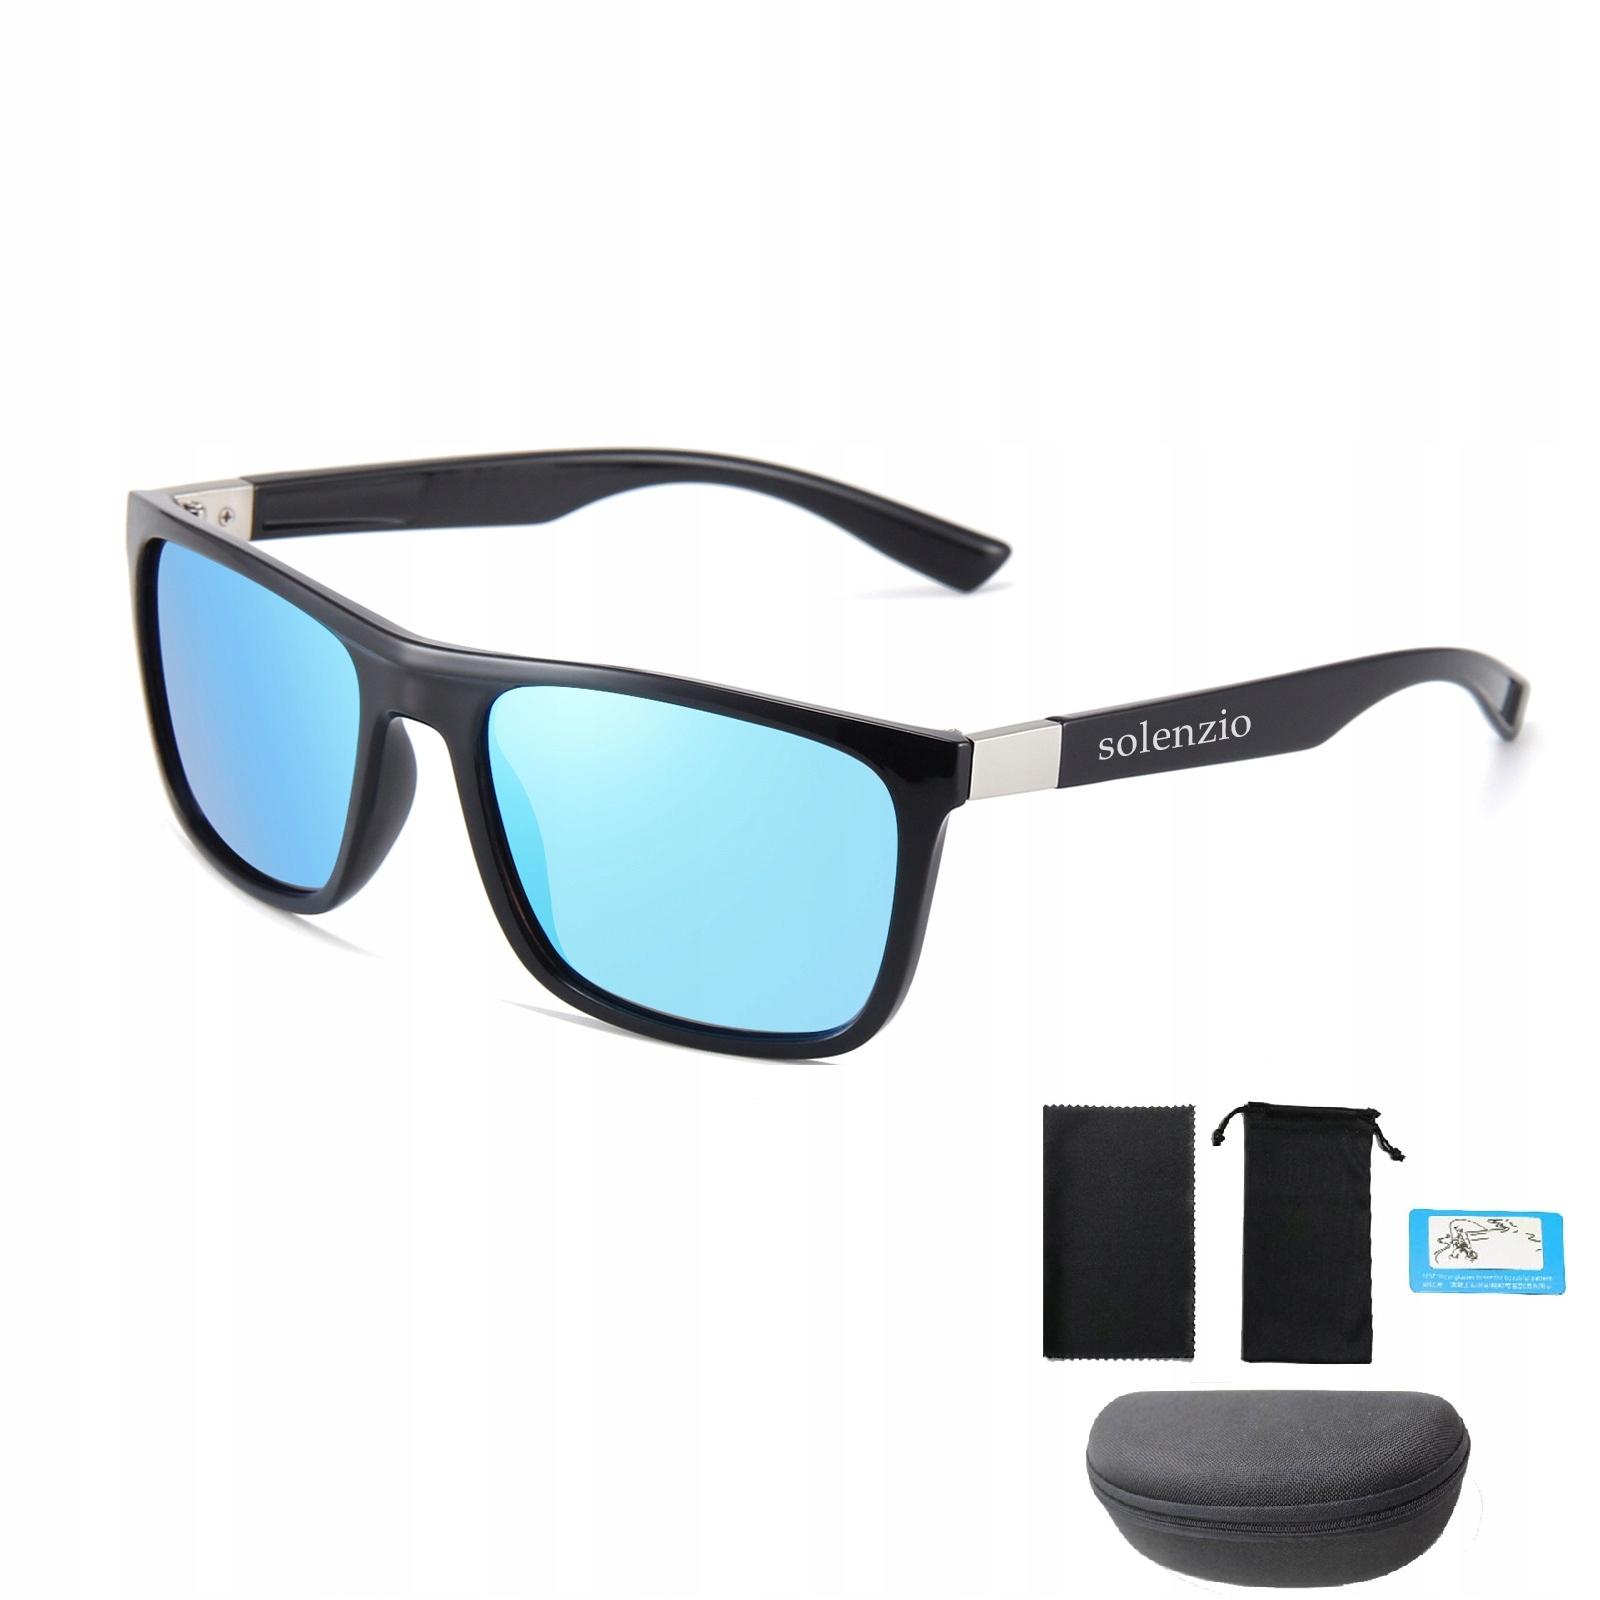 Солнечные очки Solenzio Polarization Case